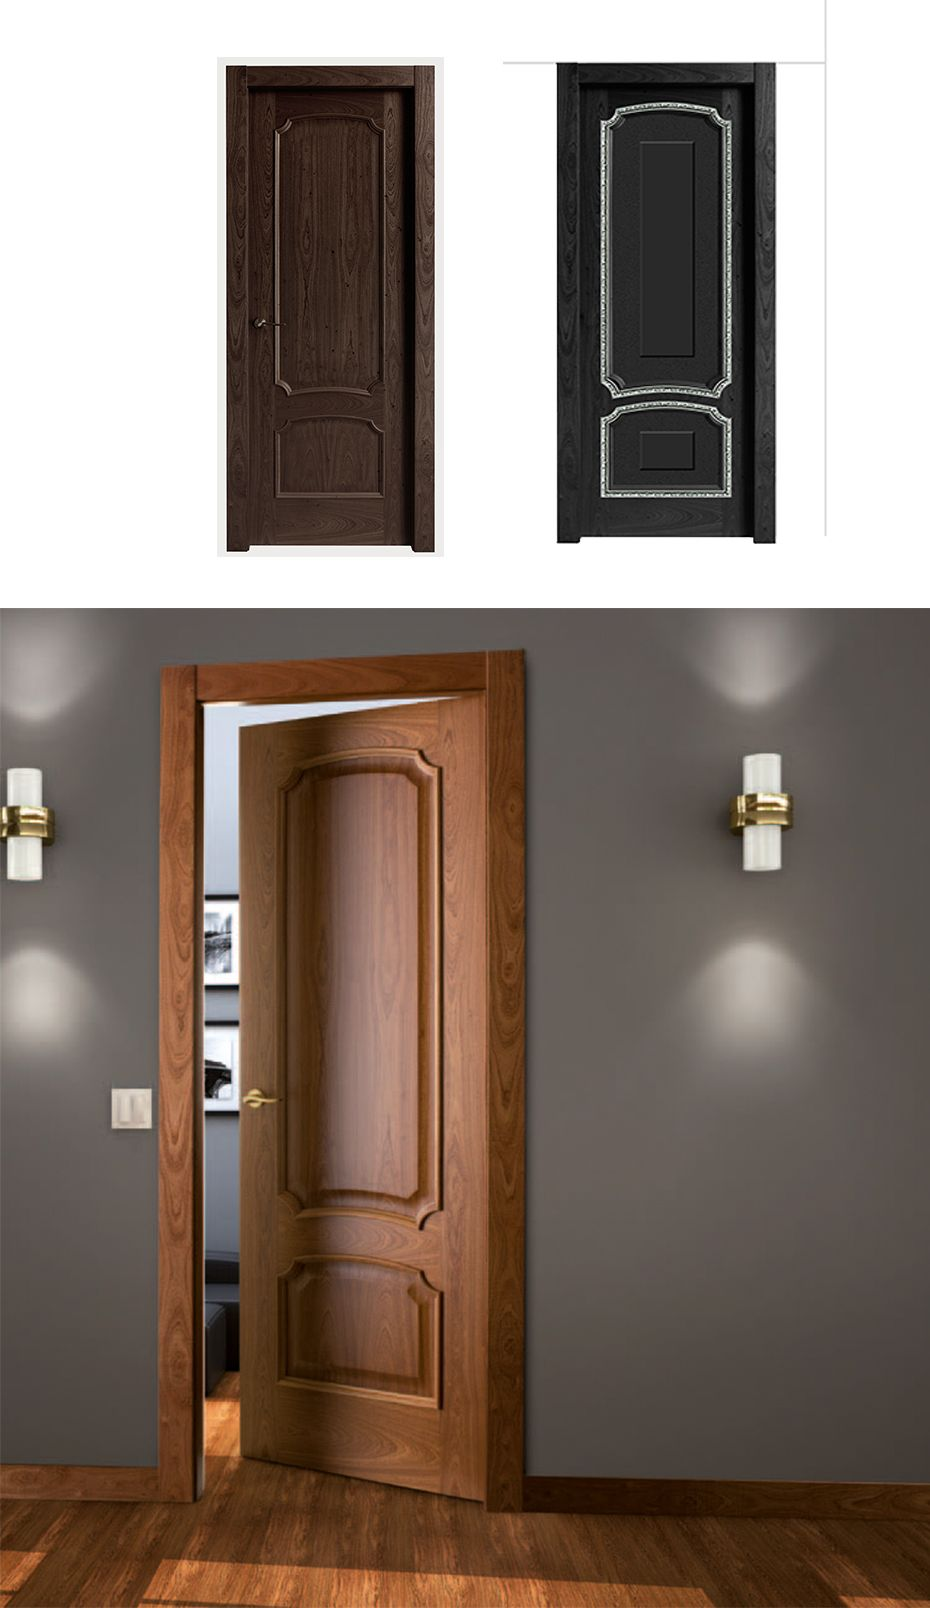 Puerta de interior oscura modelo fusa de la serie for Puertas castalla